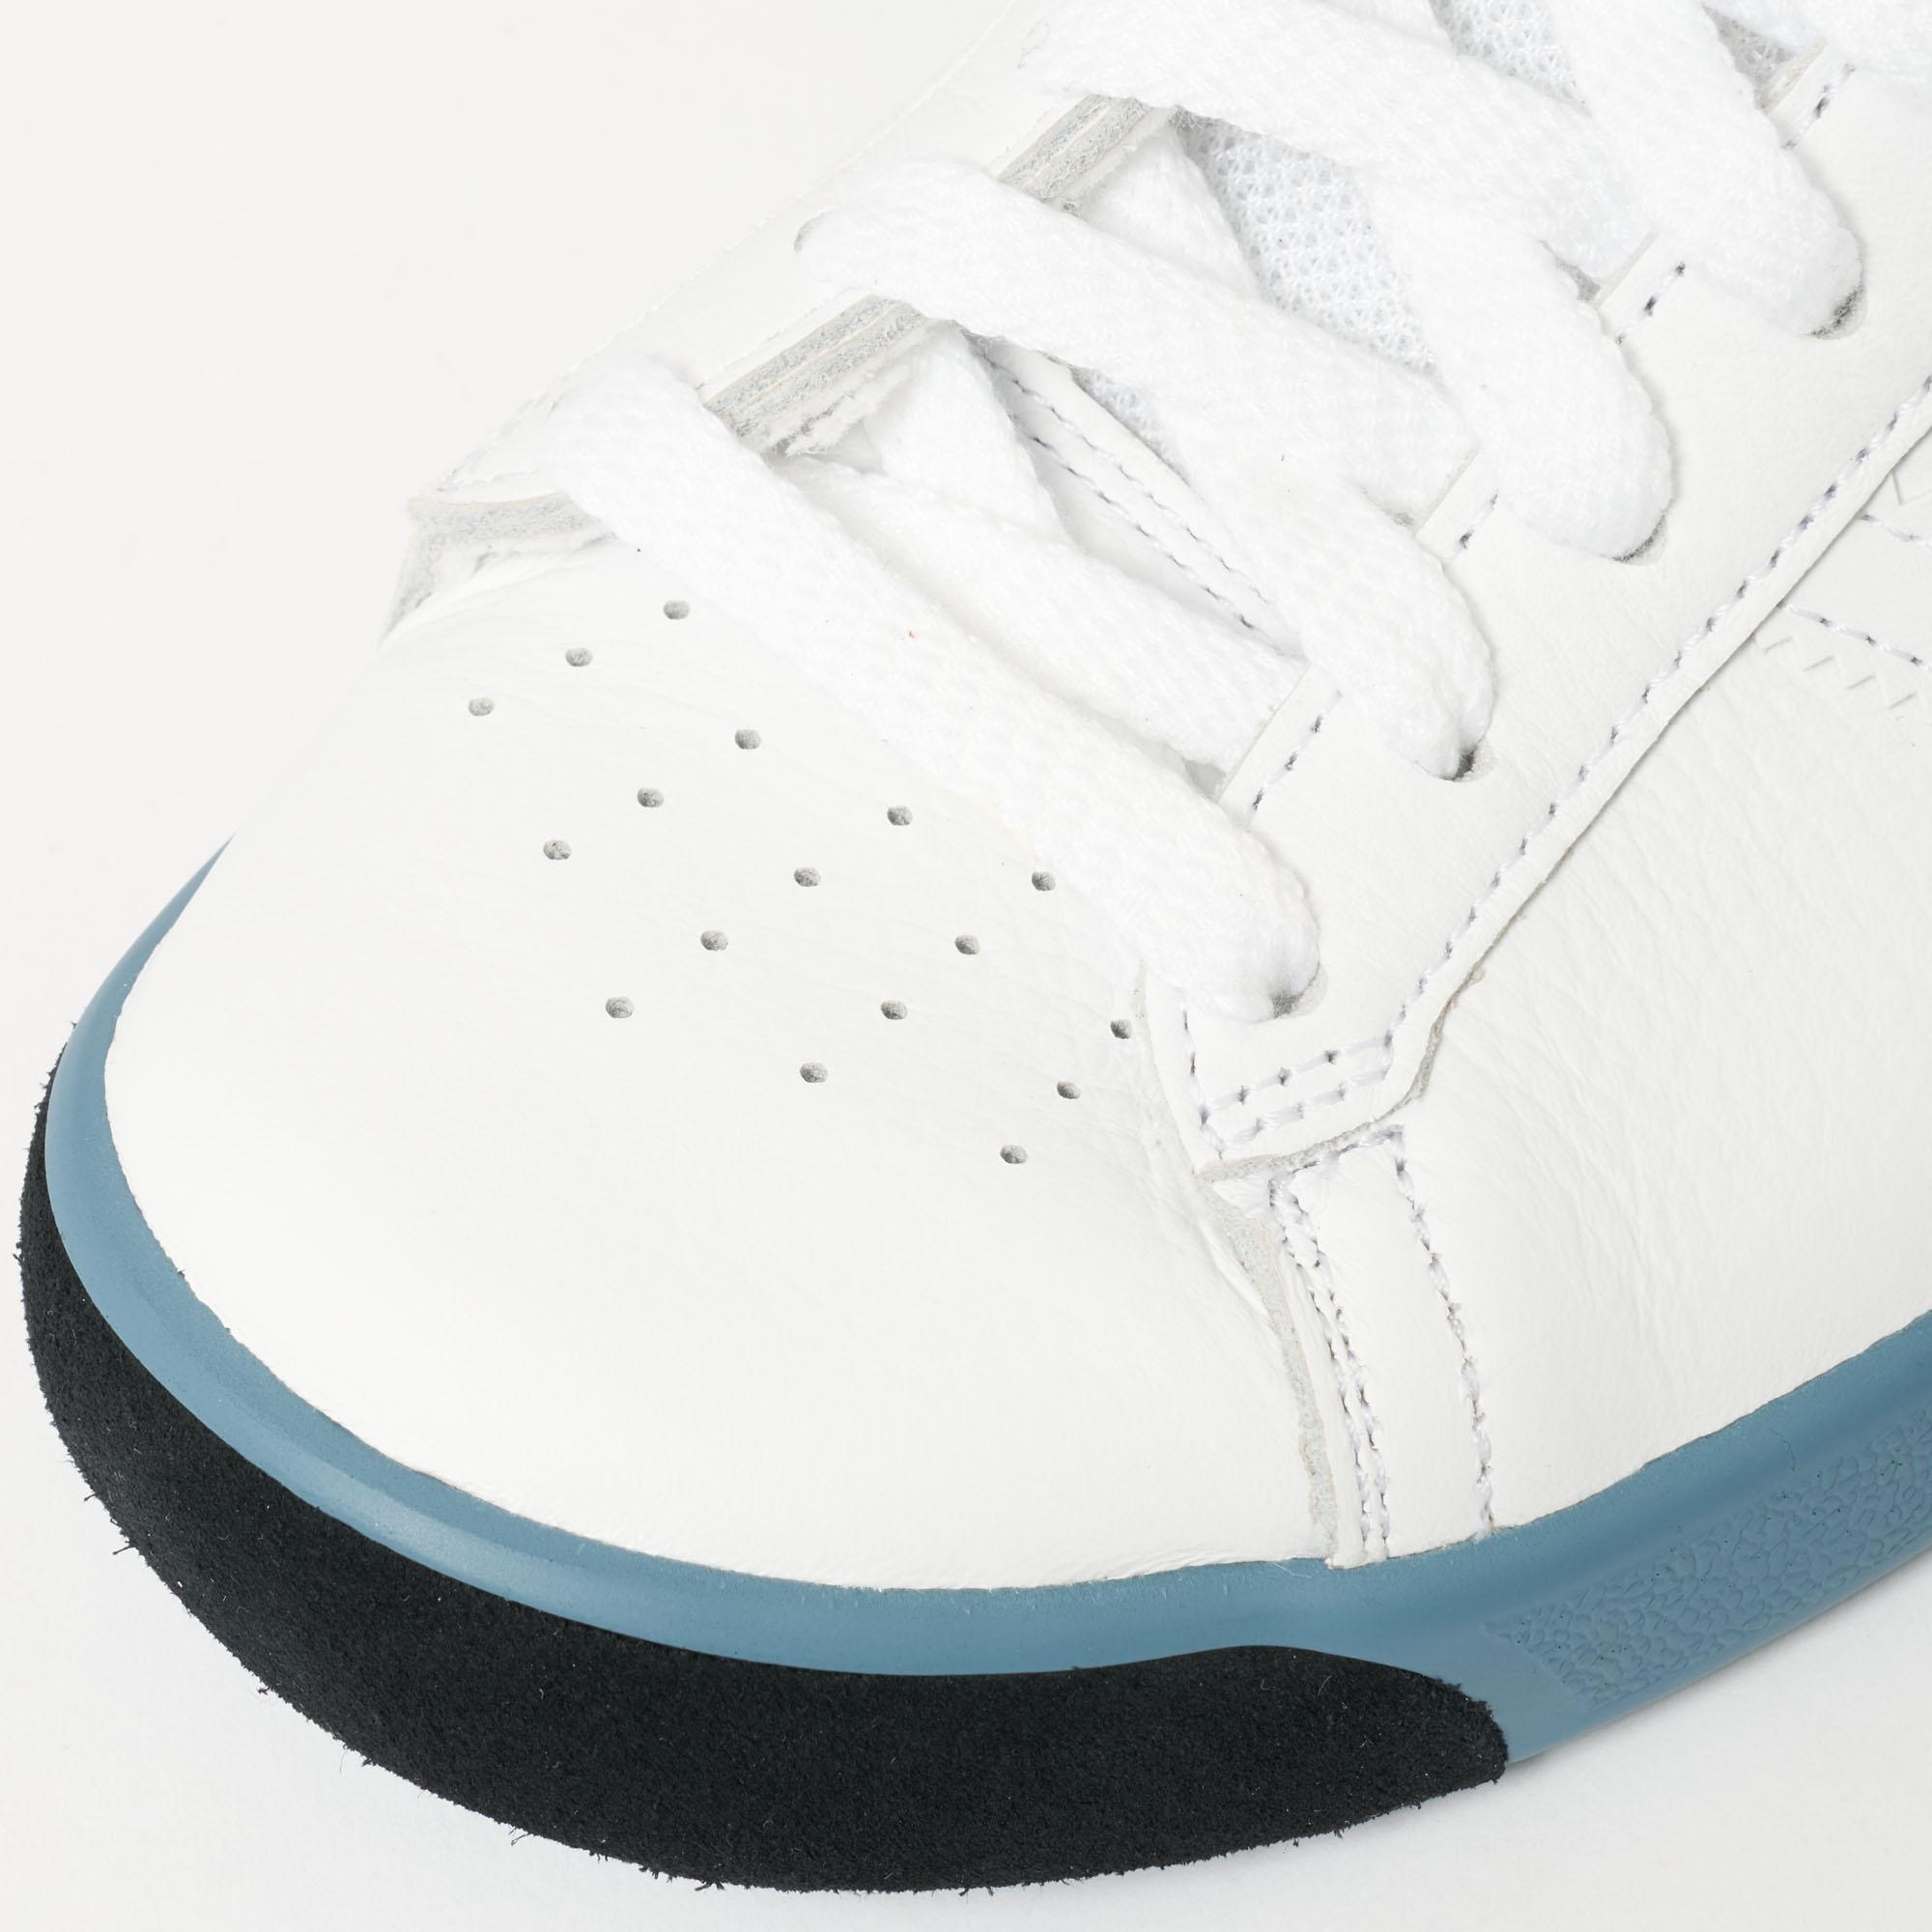 Adidas Originals Forest Hills en azul para los hombres Lyst